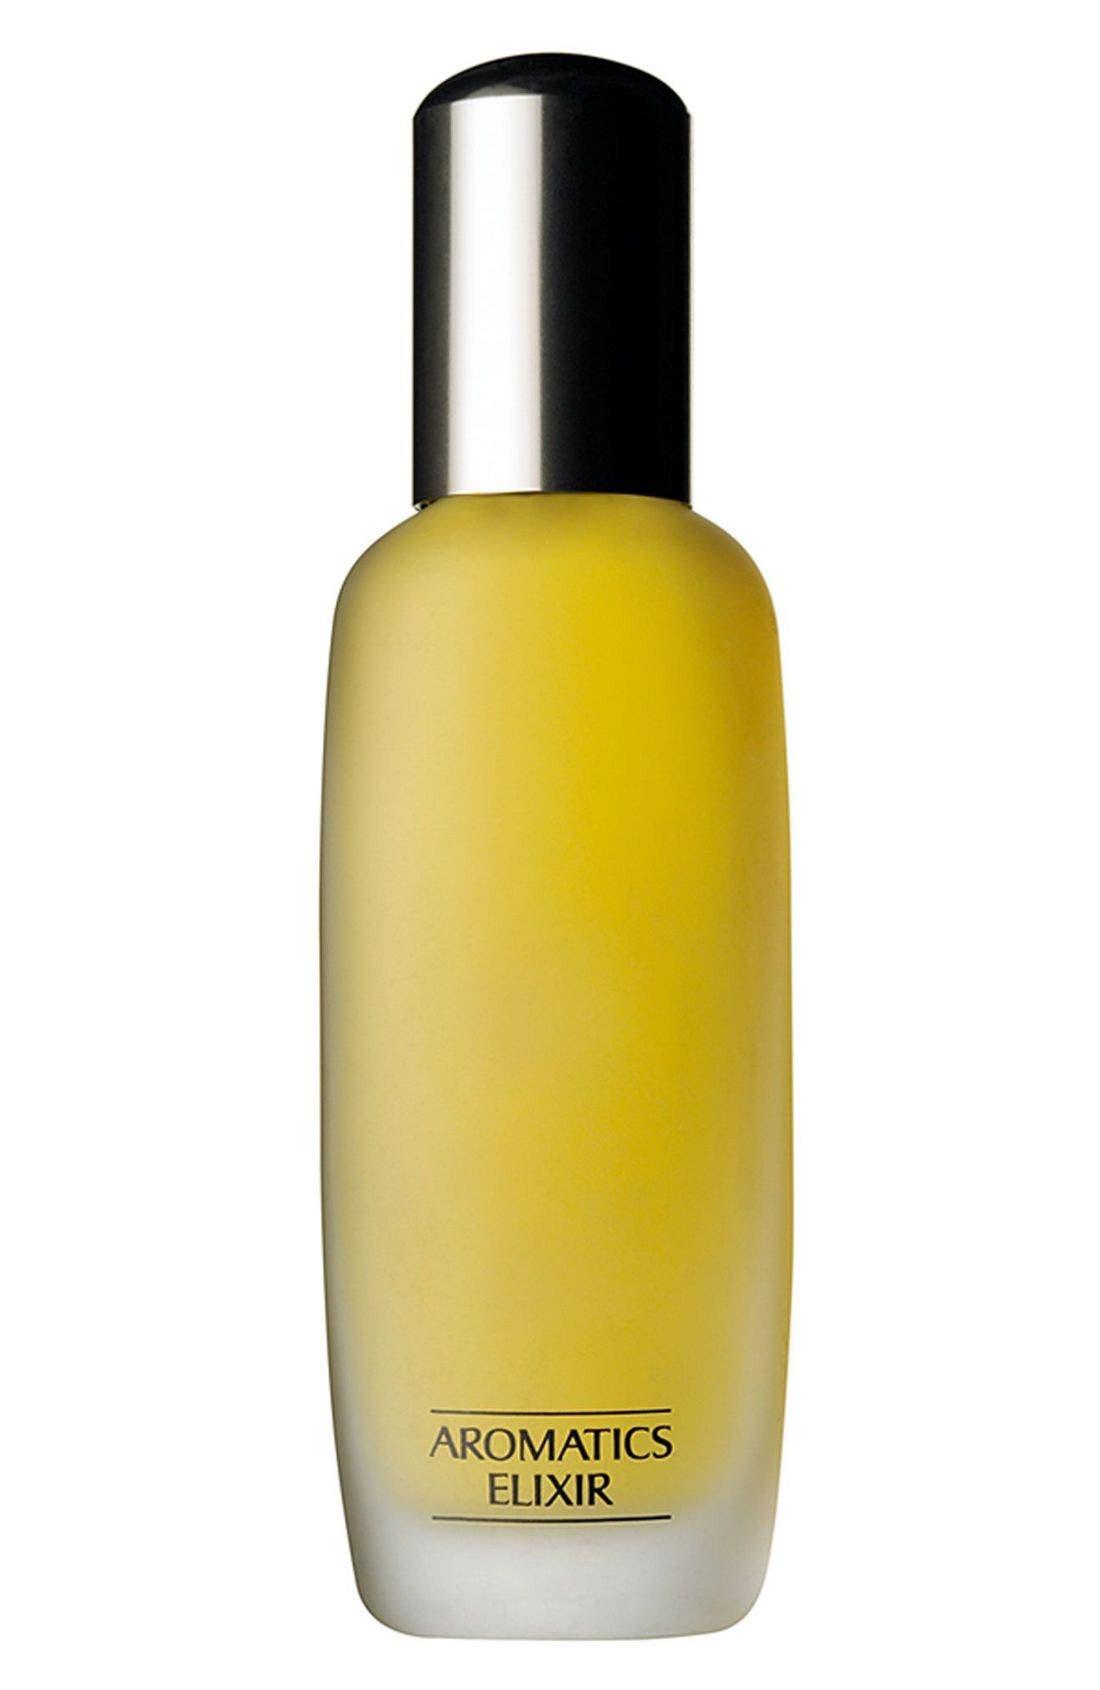 Clinique 'Aromatics Elixir' Perfume Spray